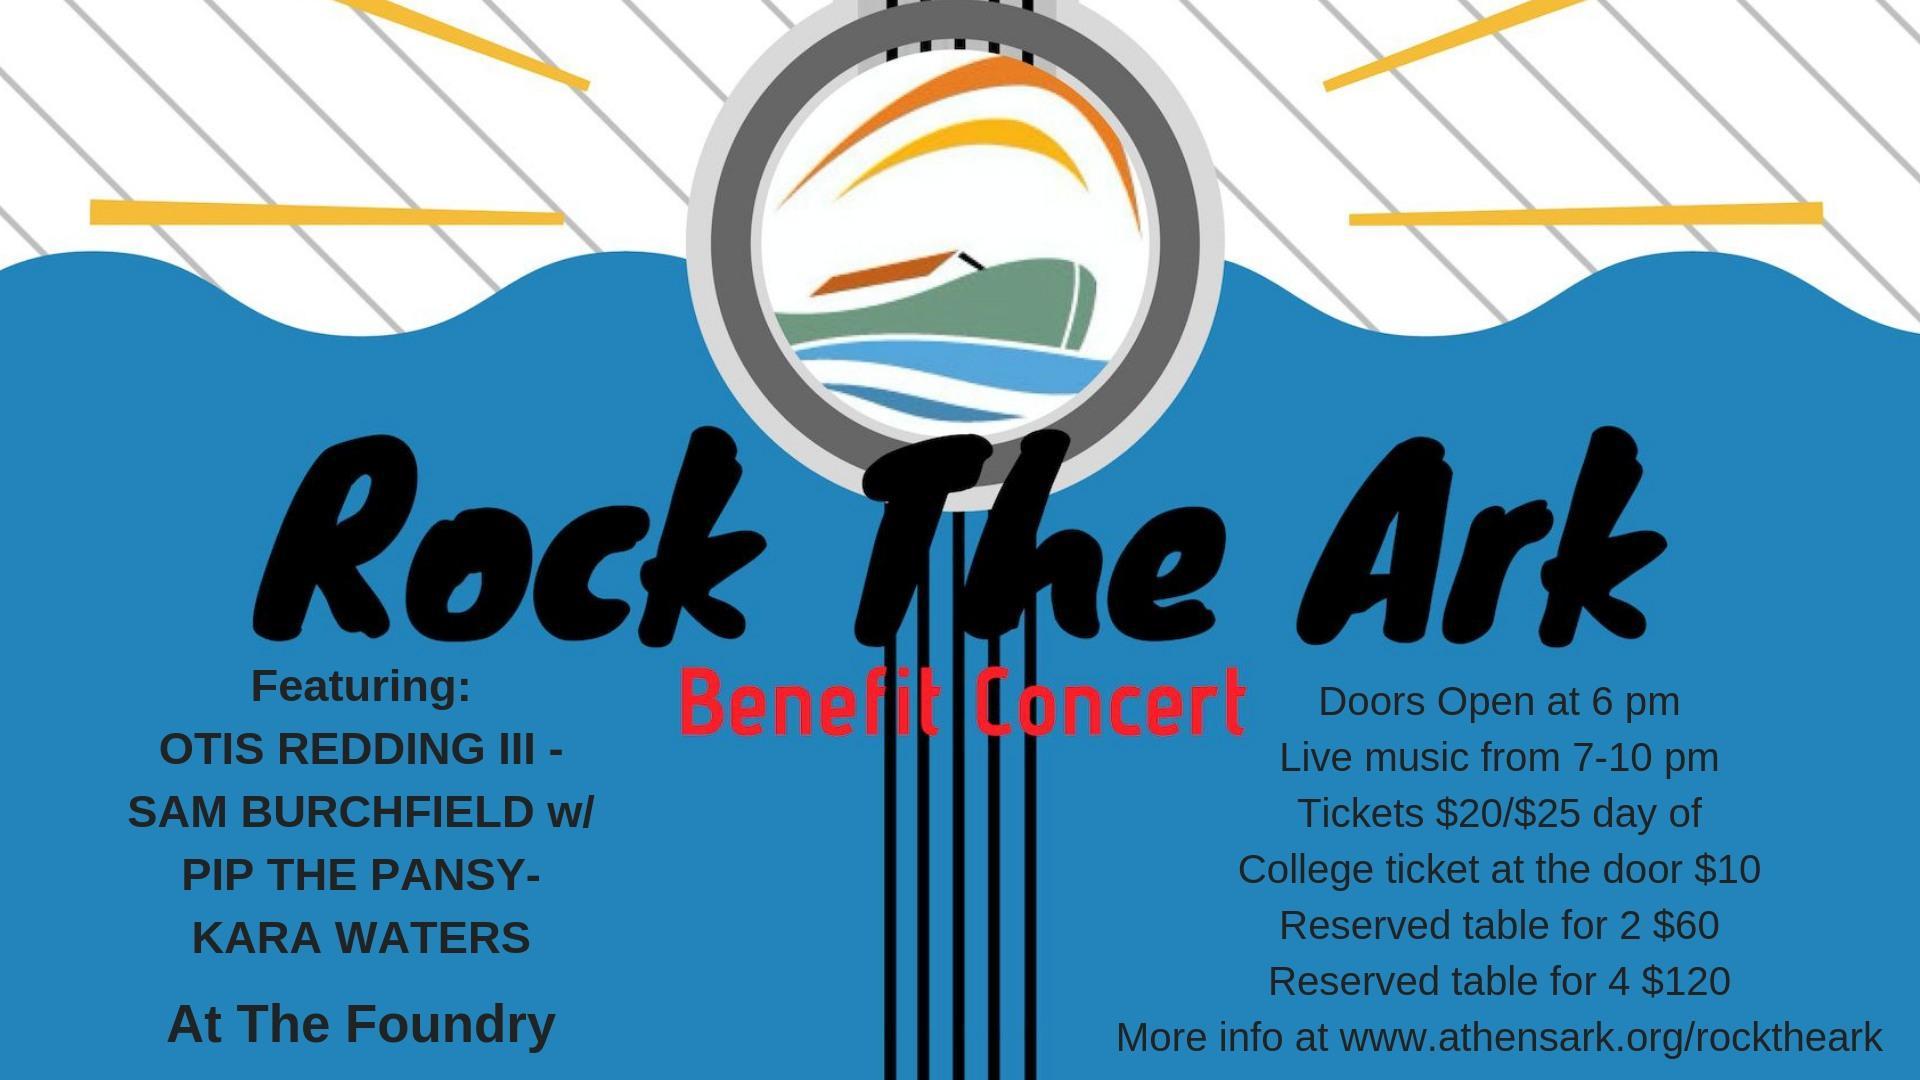 Rock the Ark Benefit Concert Thursday Night | WUGA | University of